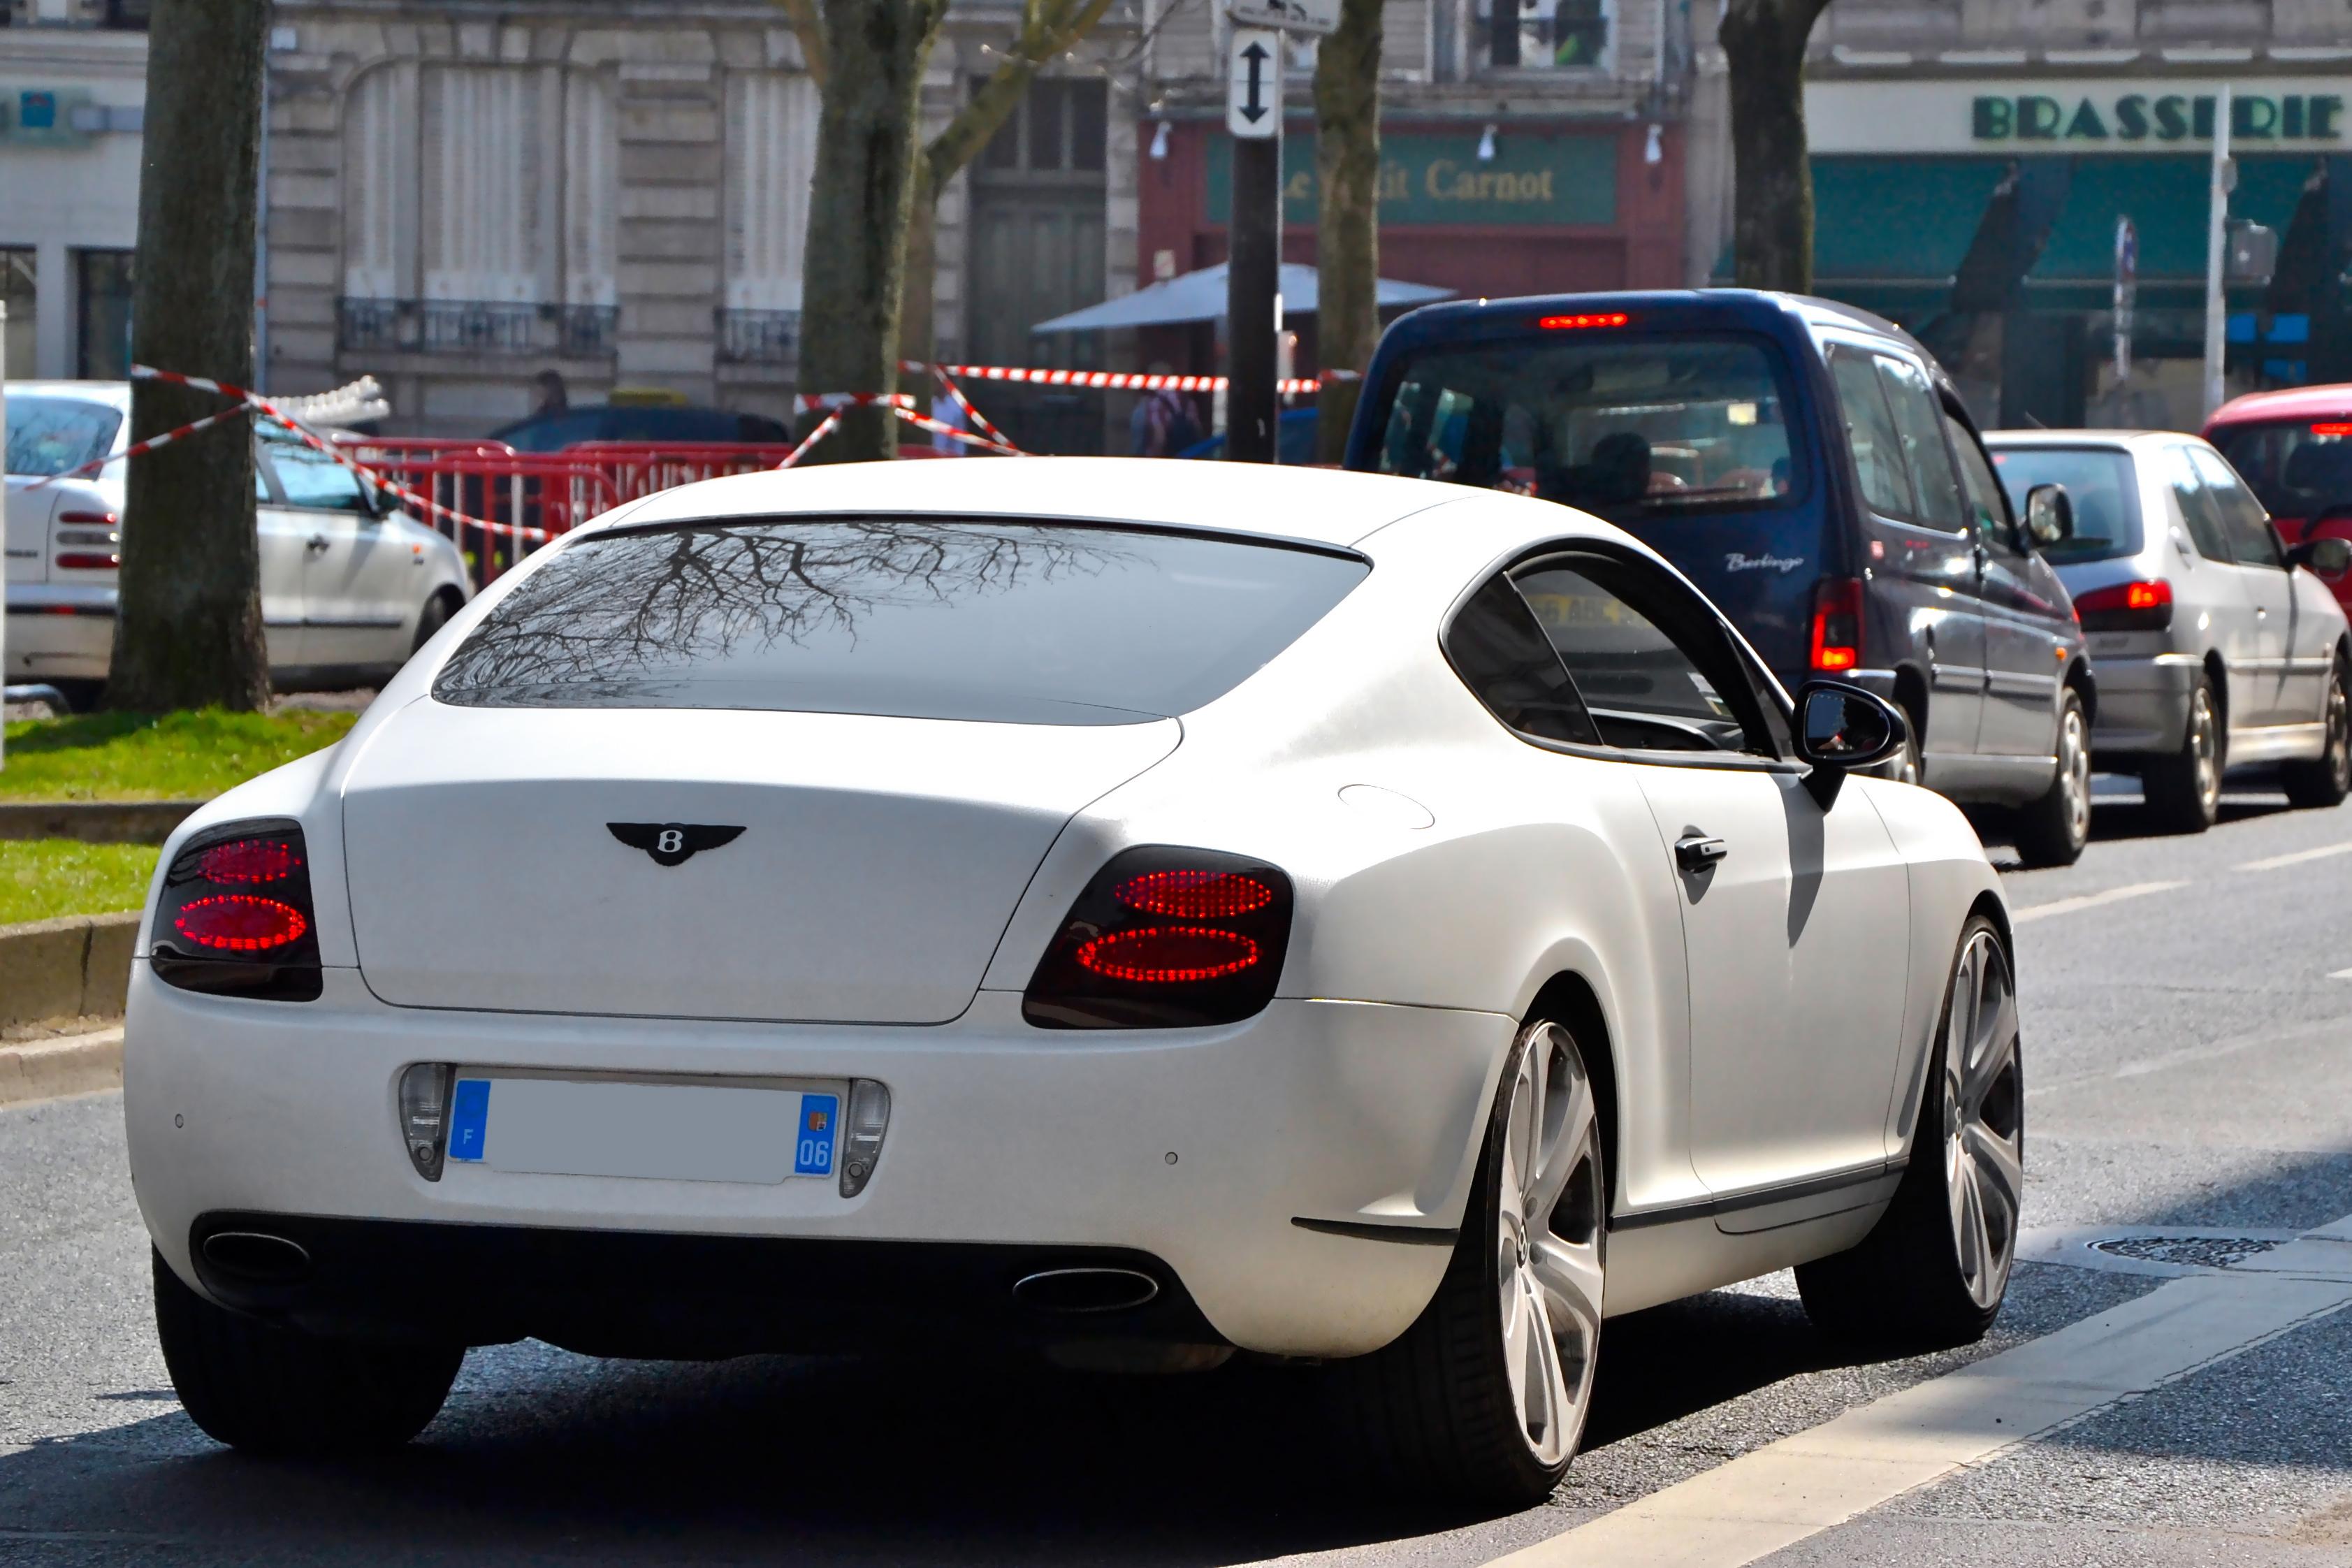 File Bentley Continental Gt Flickr Alexandre Prevot 32 Jpg Wikimedia Commons